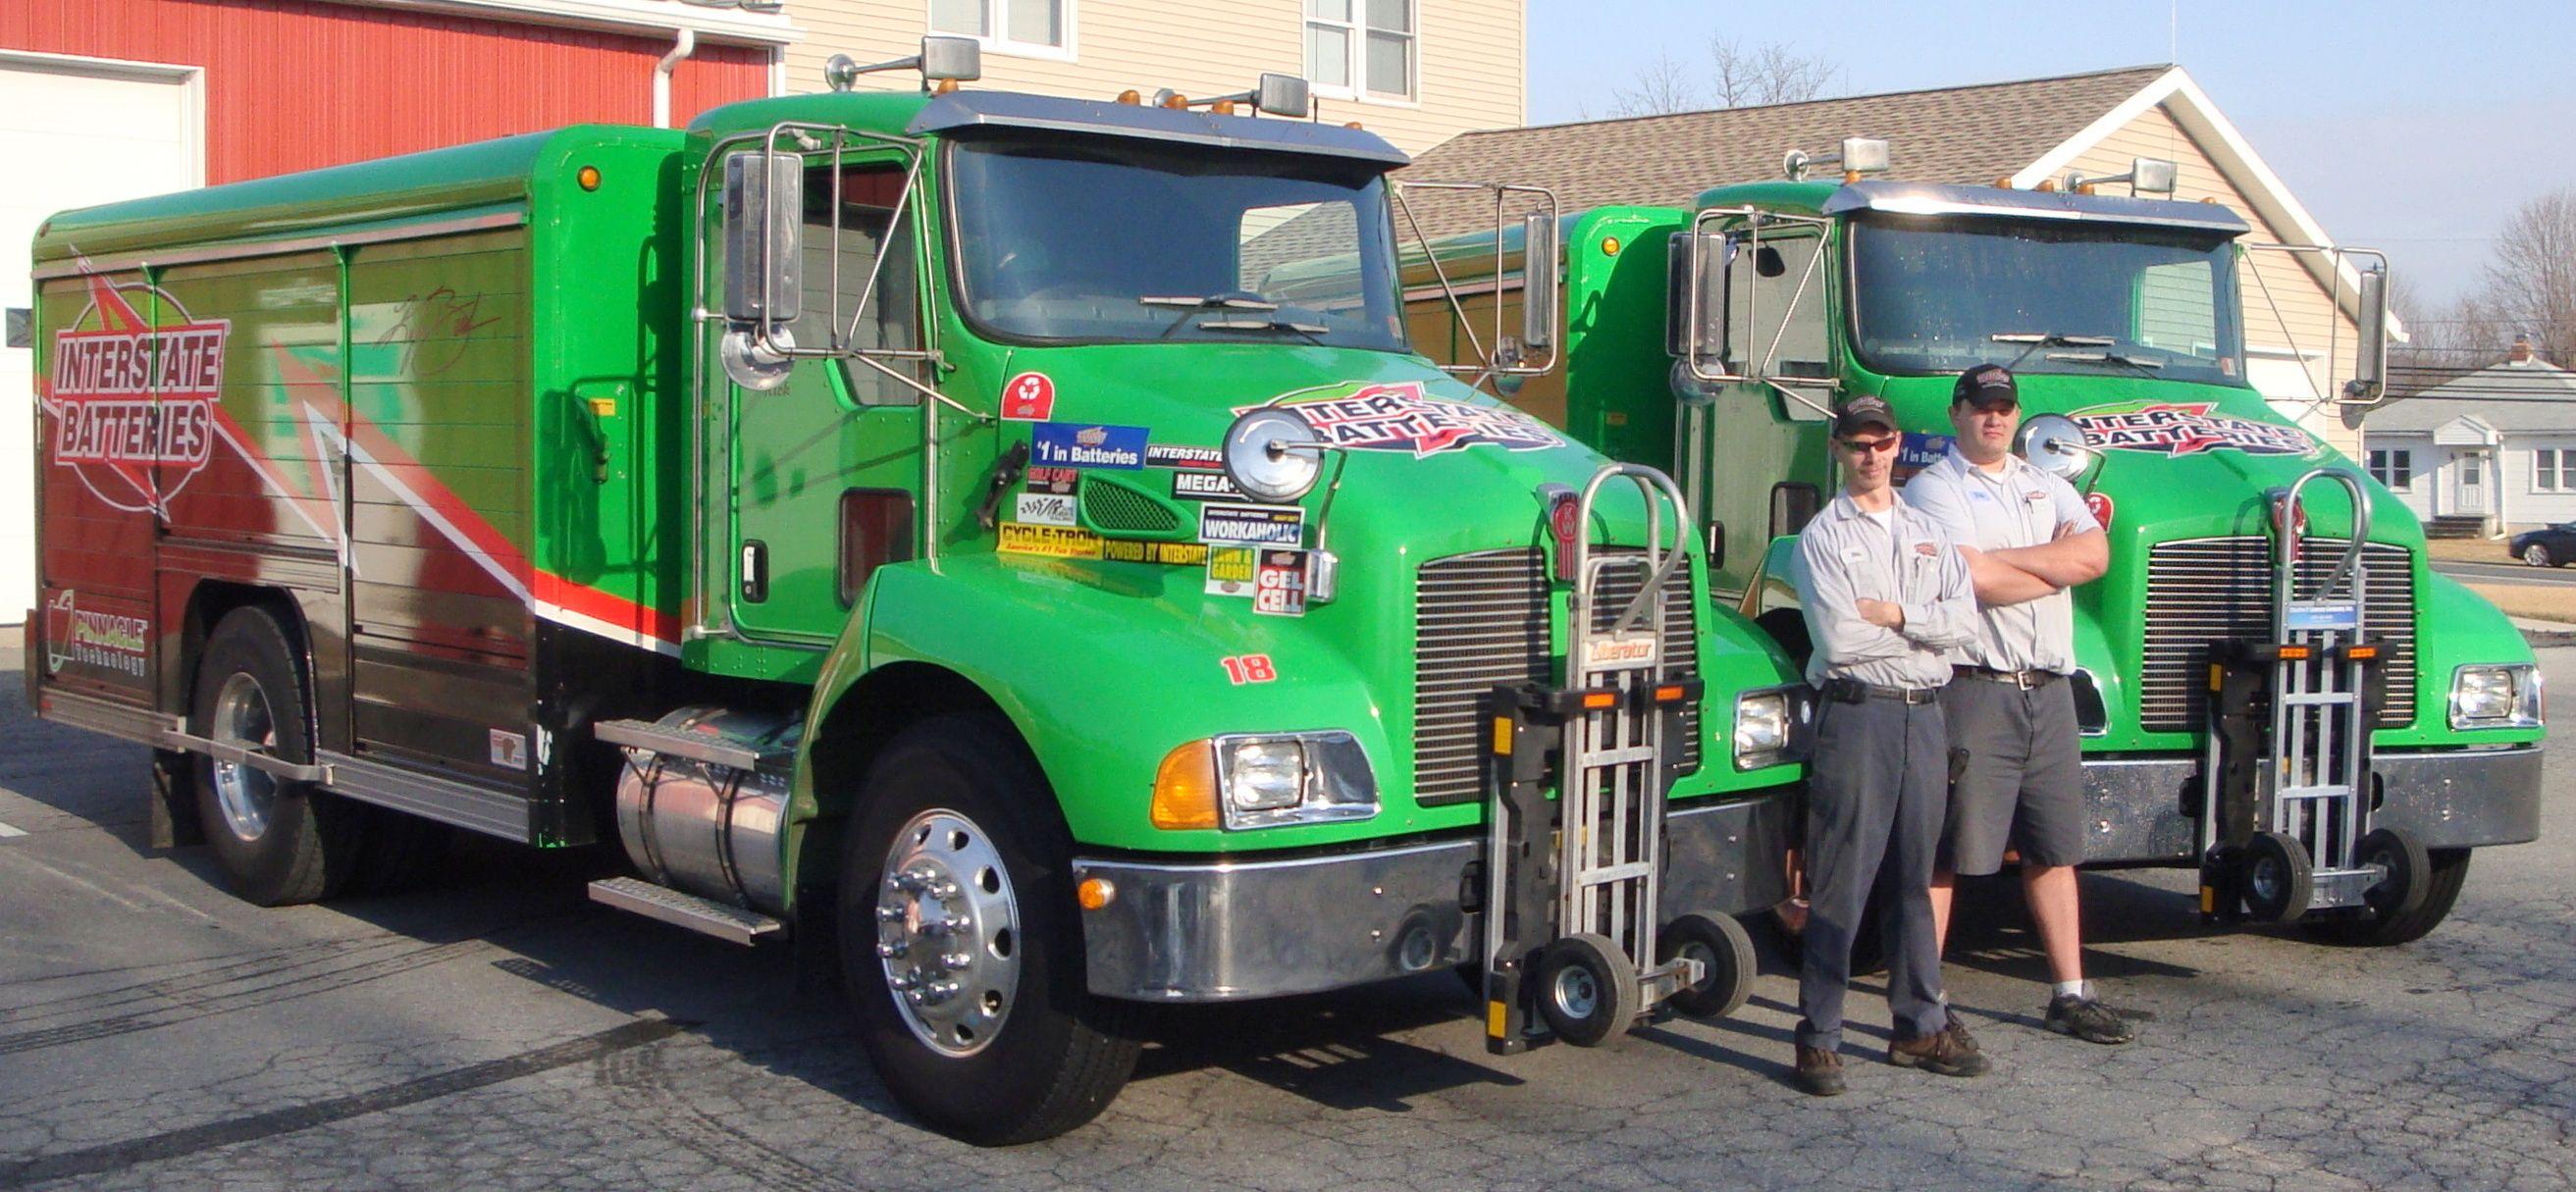 Interstate Batteries T300 Kenworth Chassis Trucks Kenworth Hand Trucks